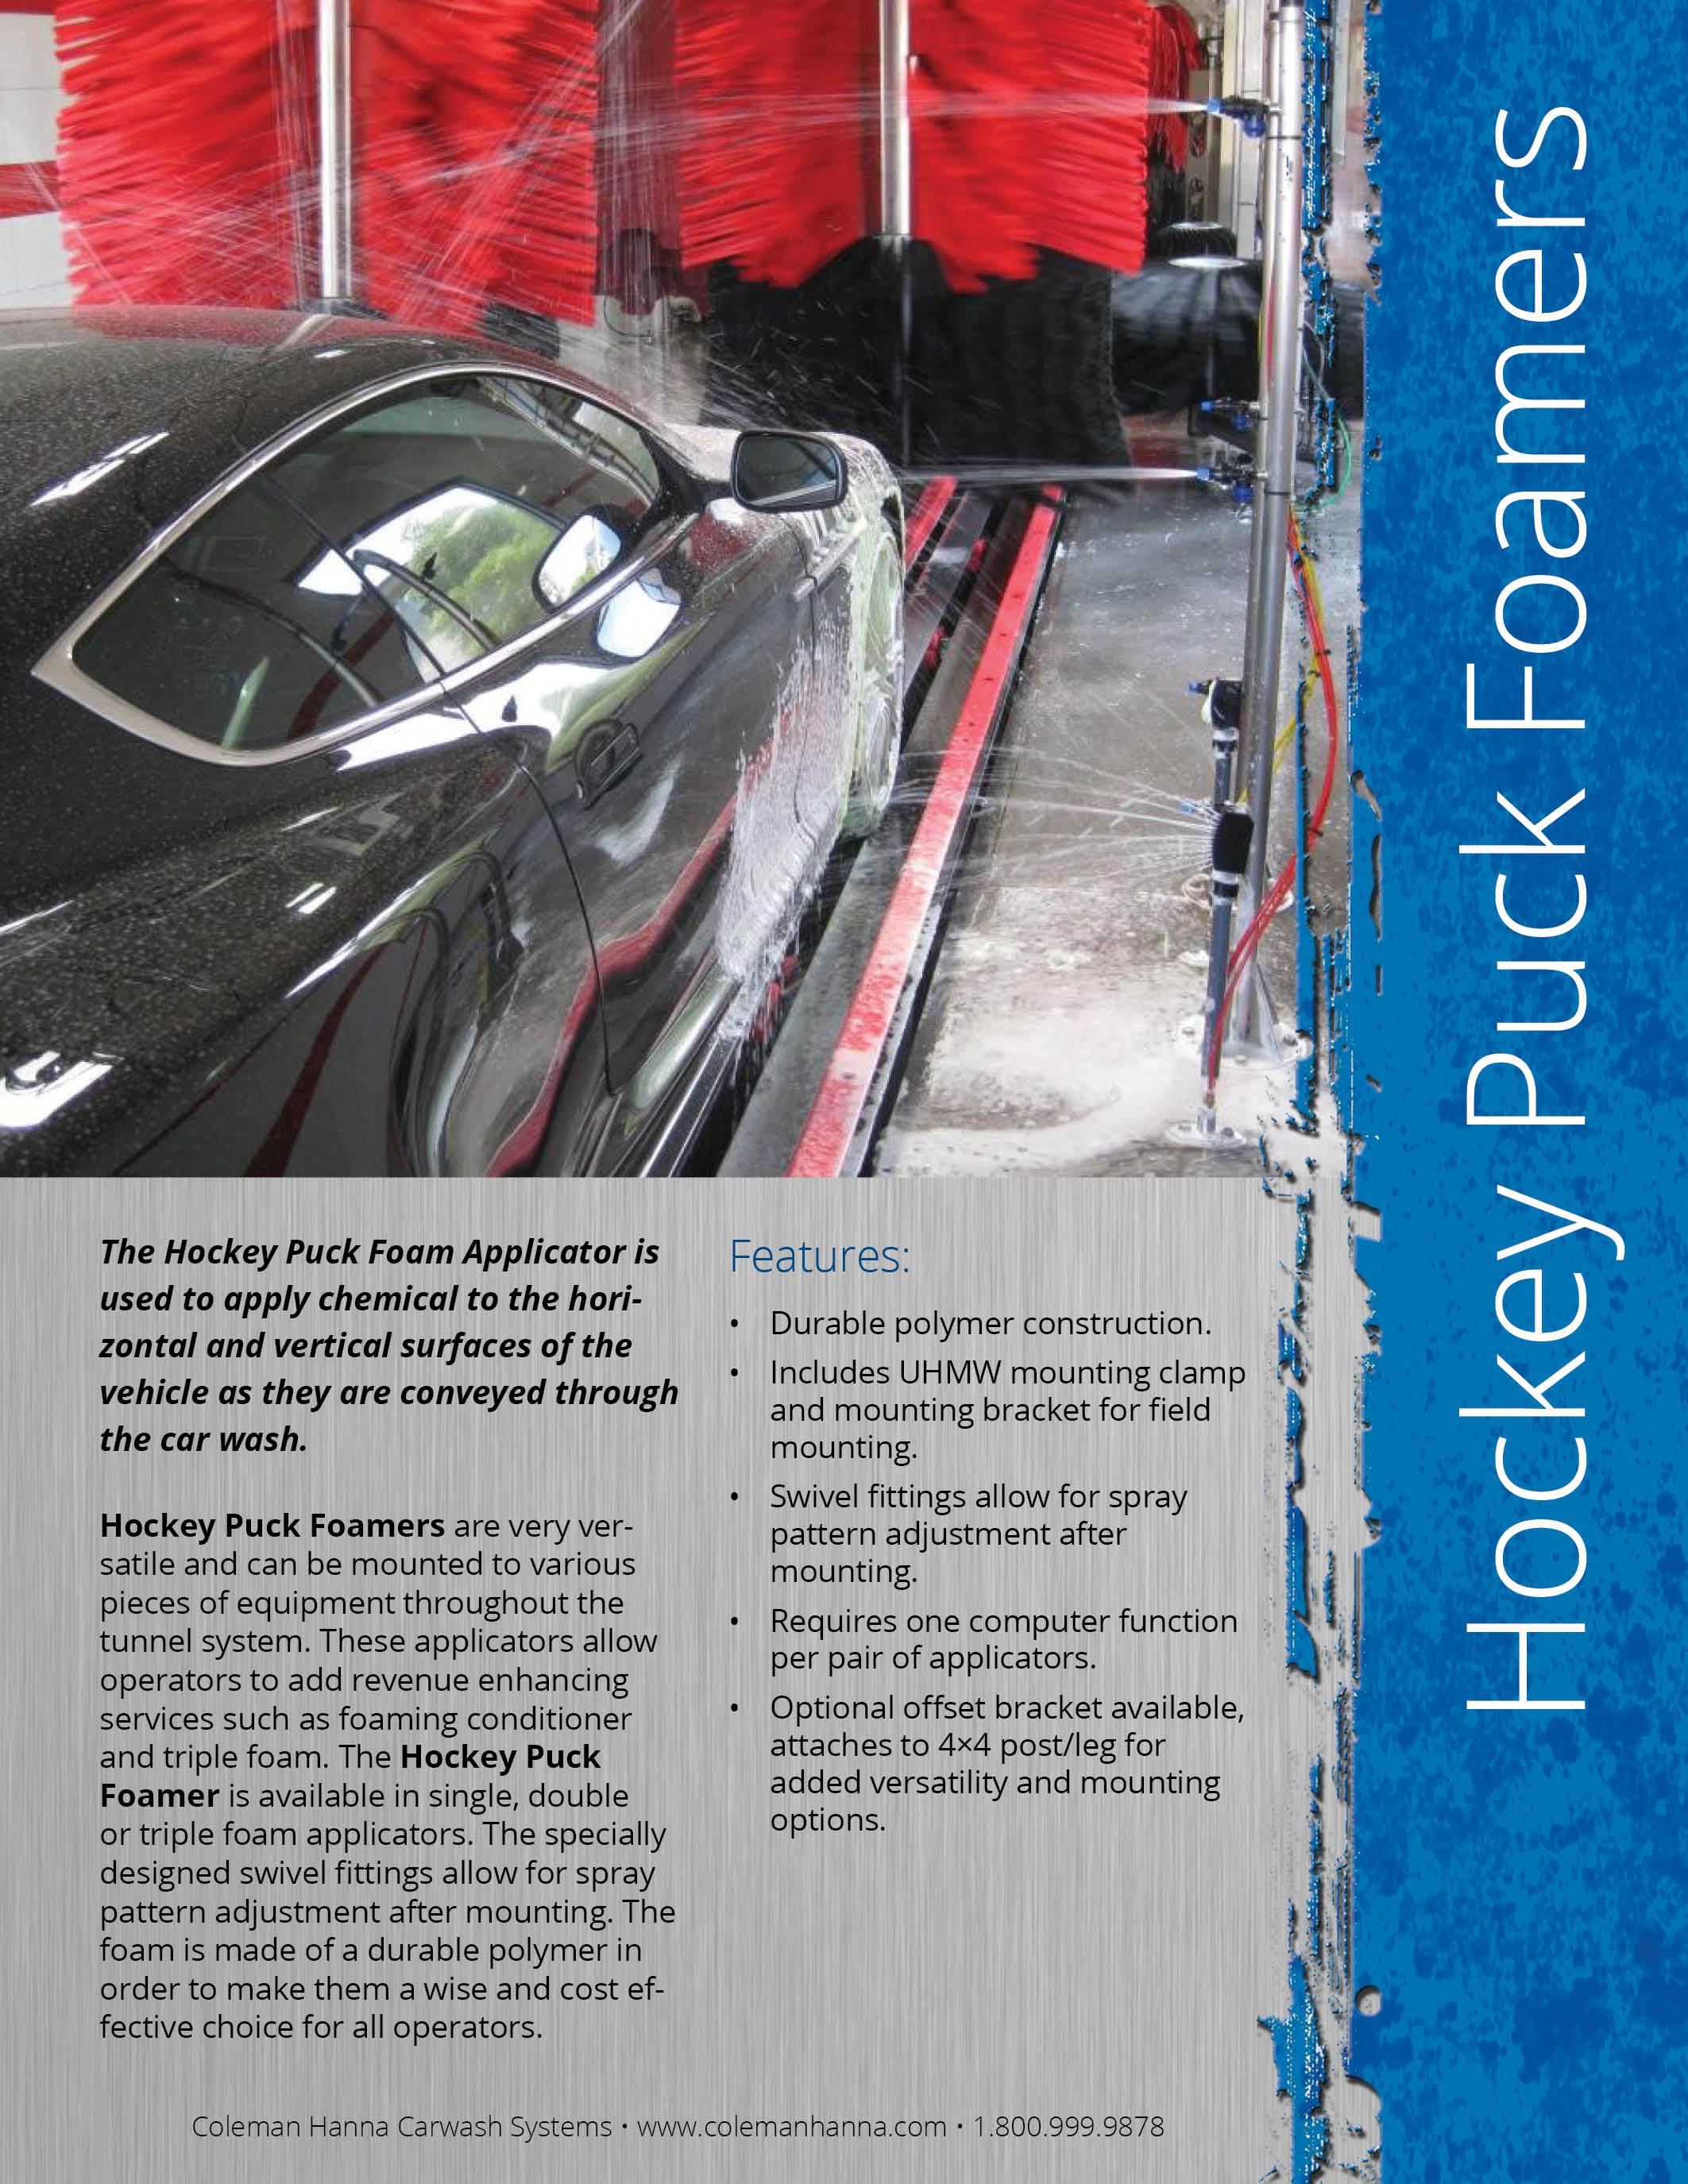 Hockey Puck Foaming Applicator